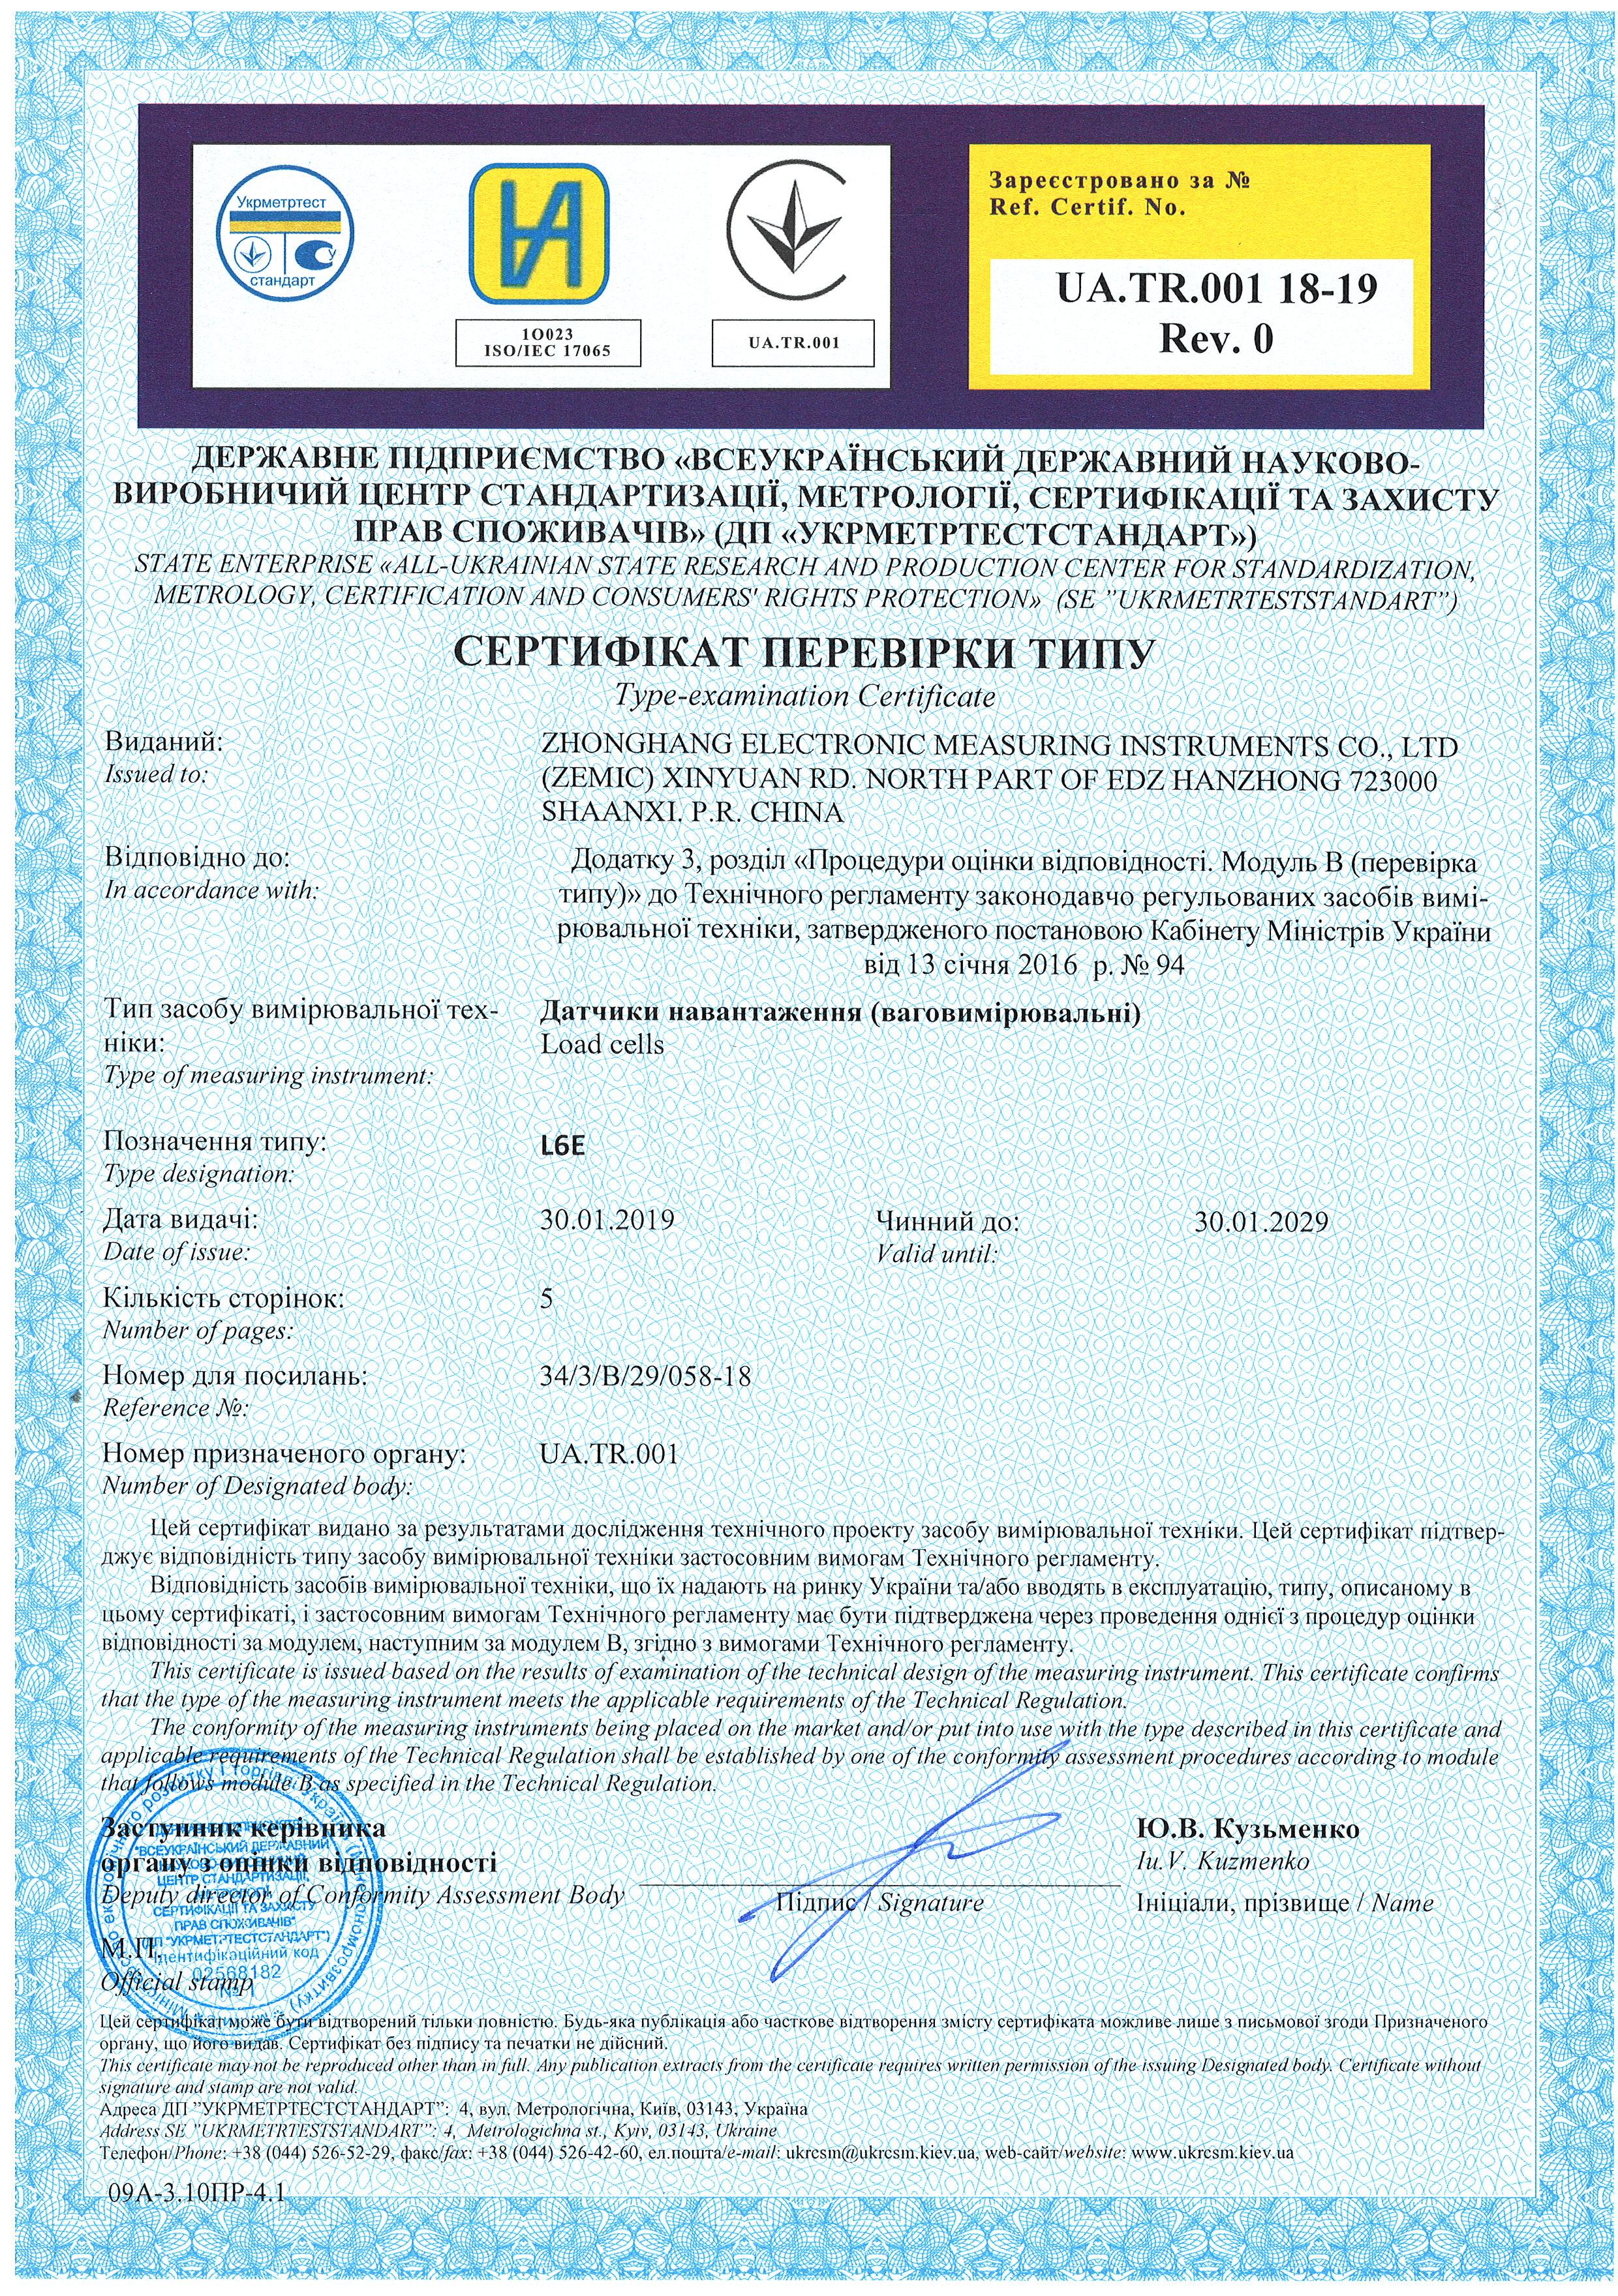 Сертификат Украины ZEMIC  тип модели L6Е